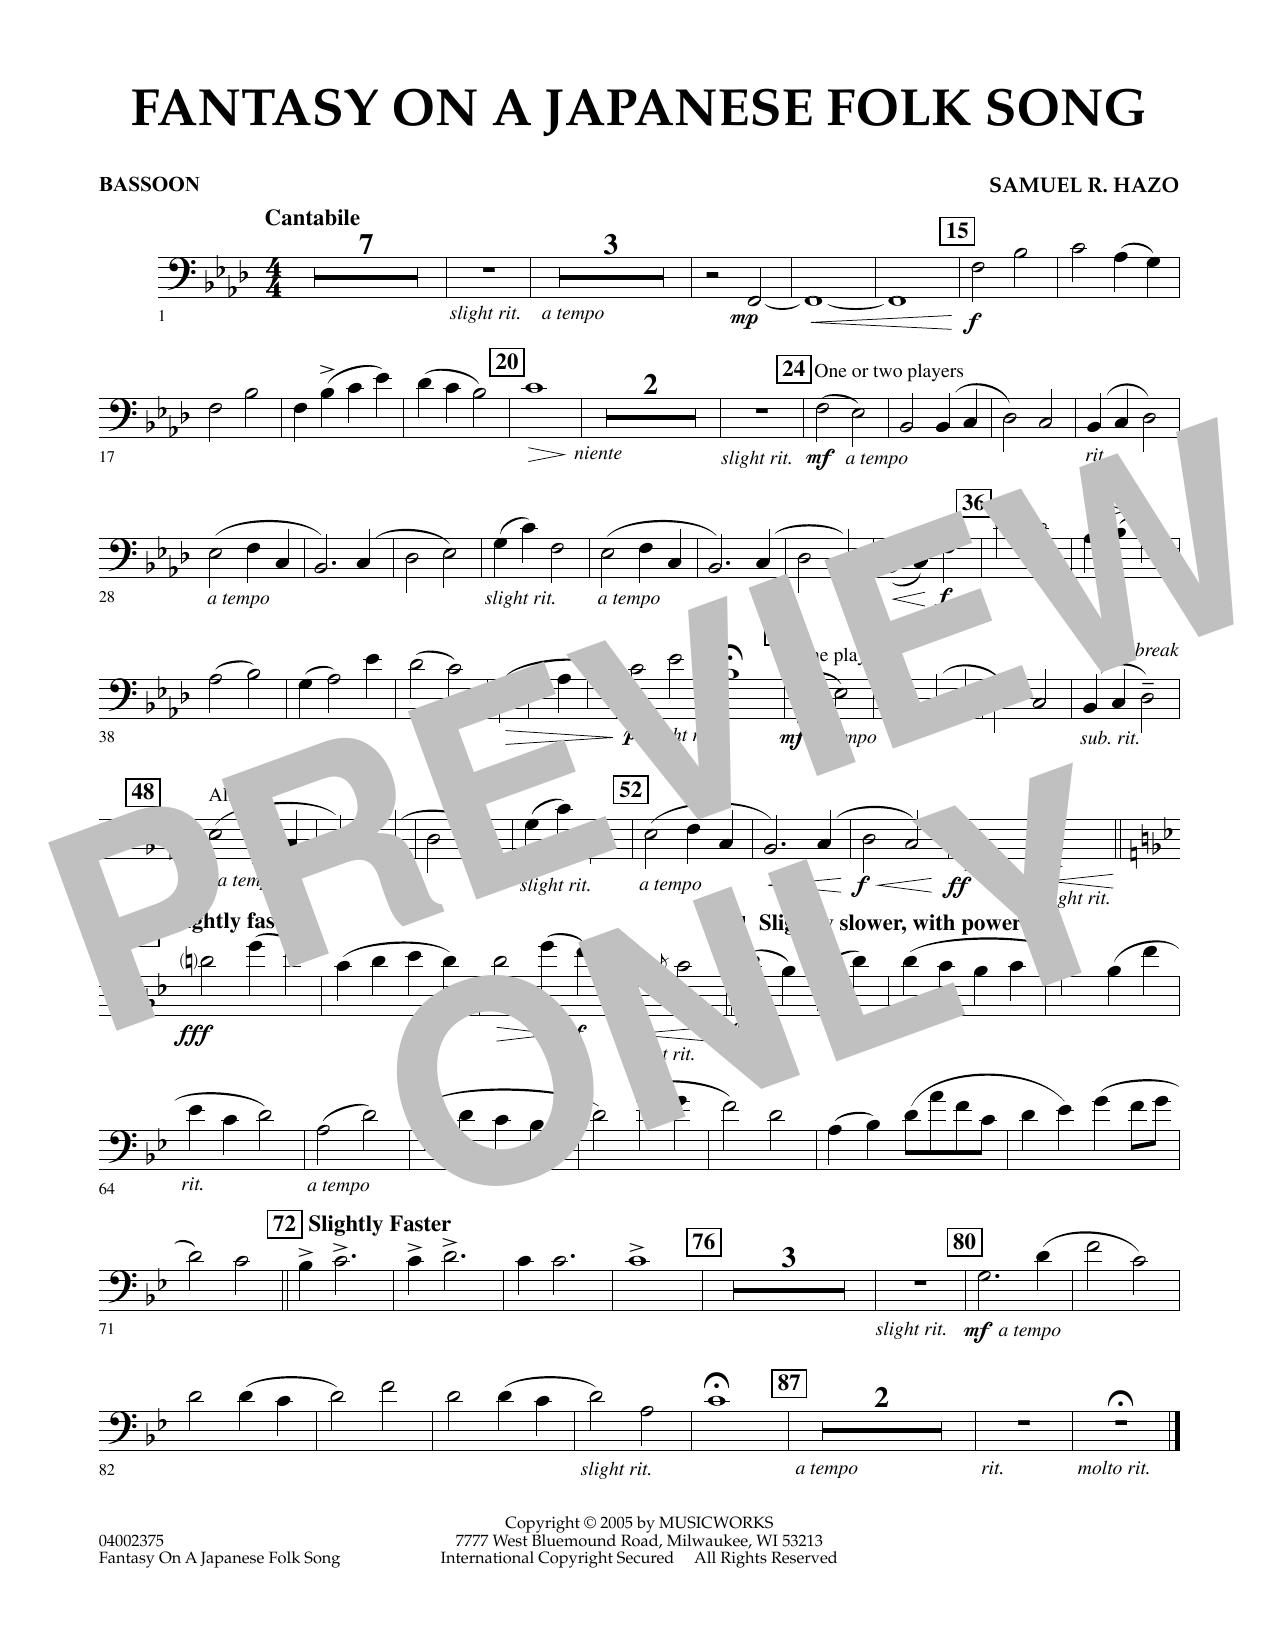 Samuel R. Hazo Fantasy On A Japanese Folk Song - Bassoon sheet music notes and chords. Download Printable PDF.